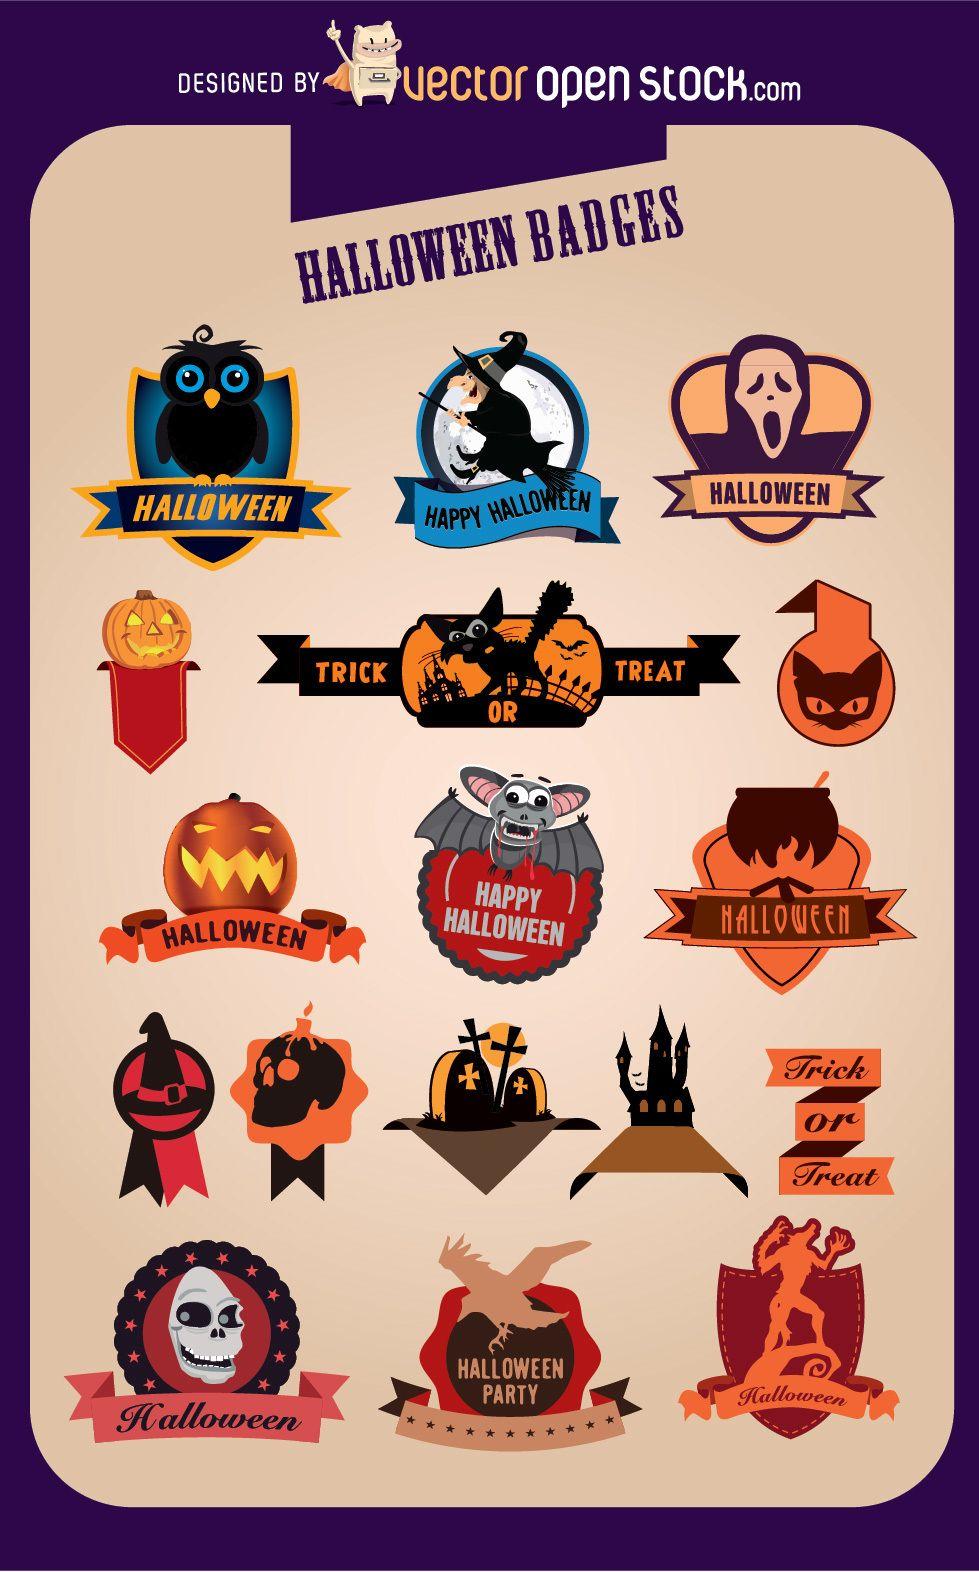 17 insignias creativas de Halloween